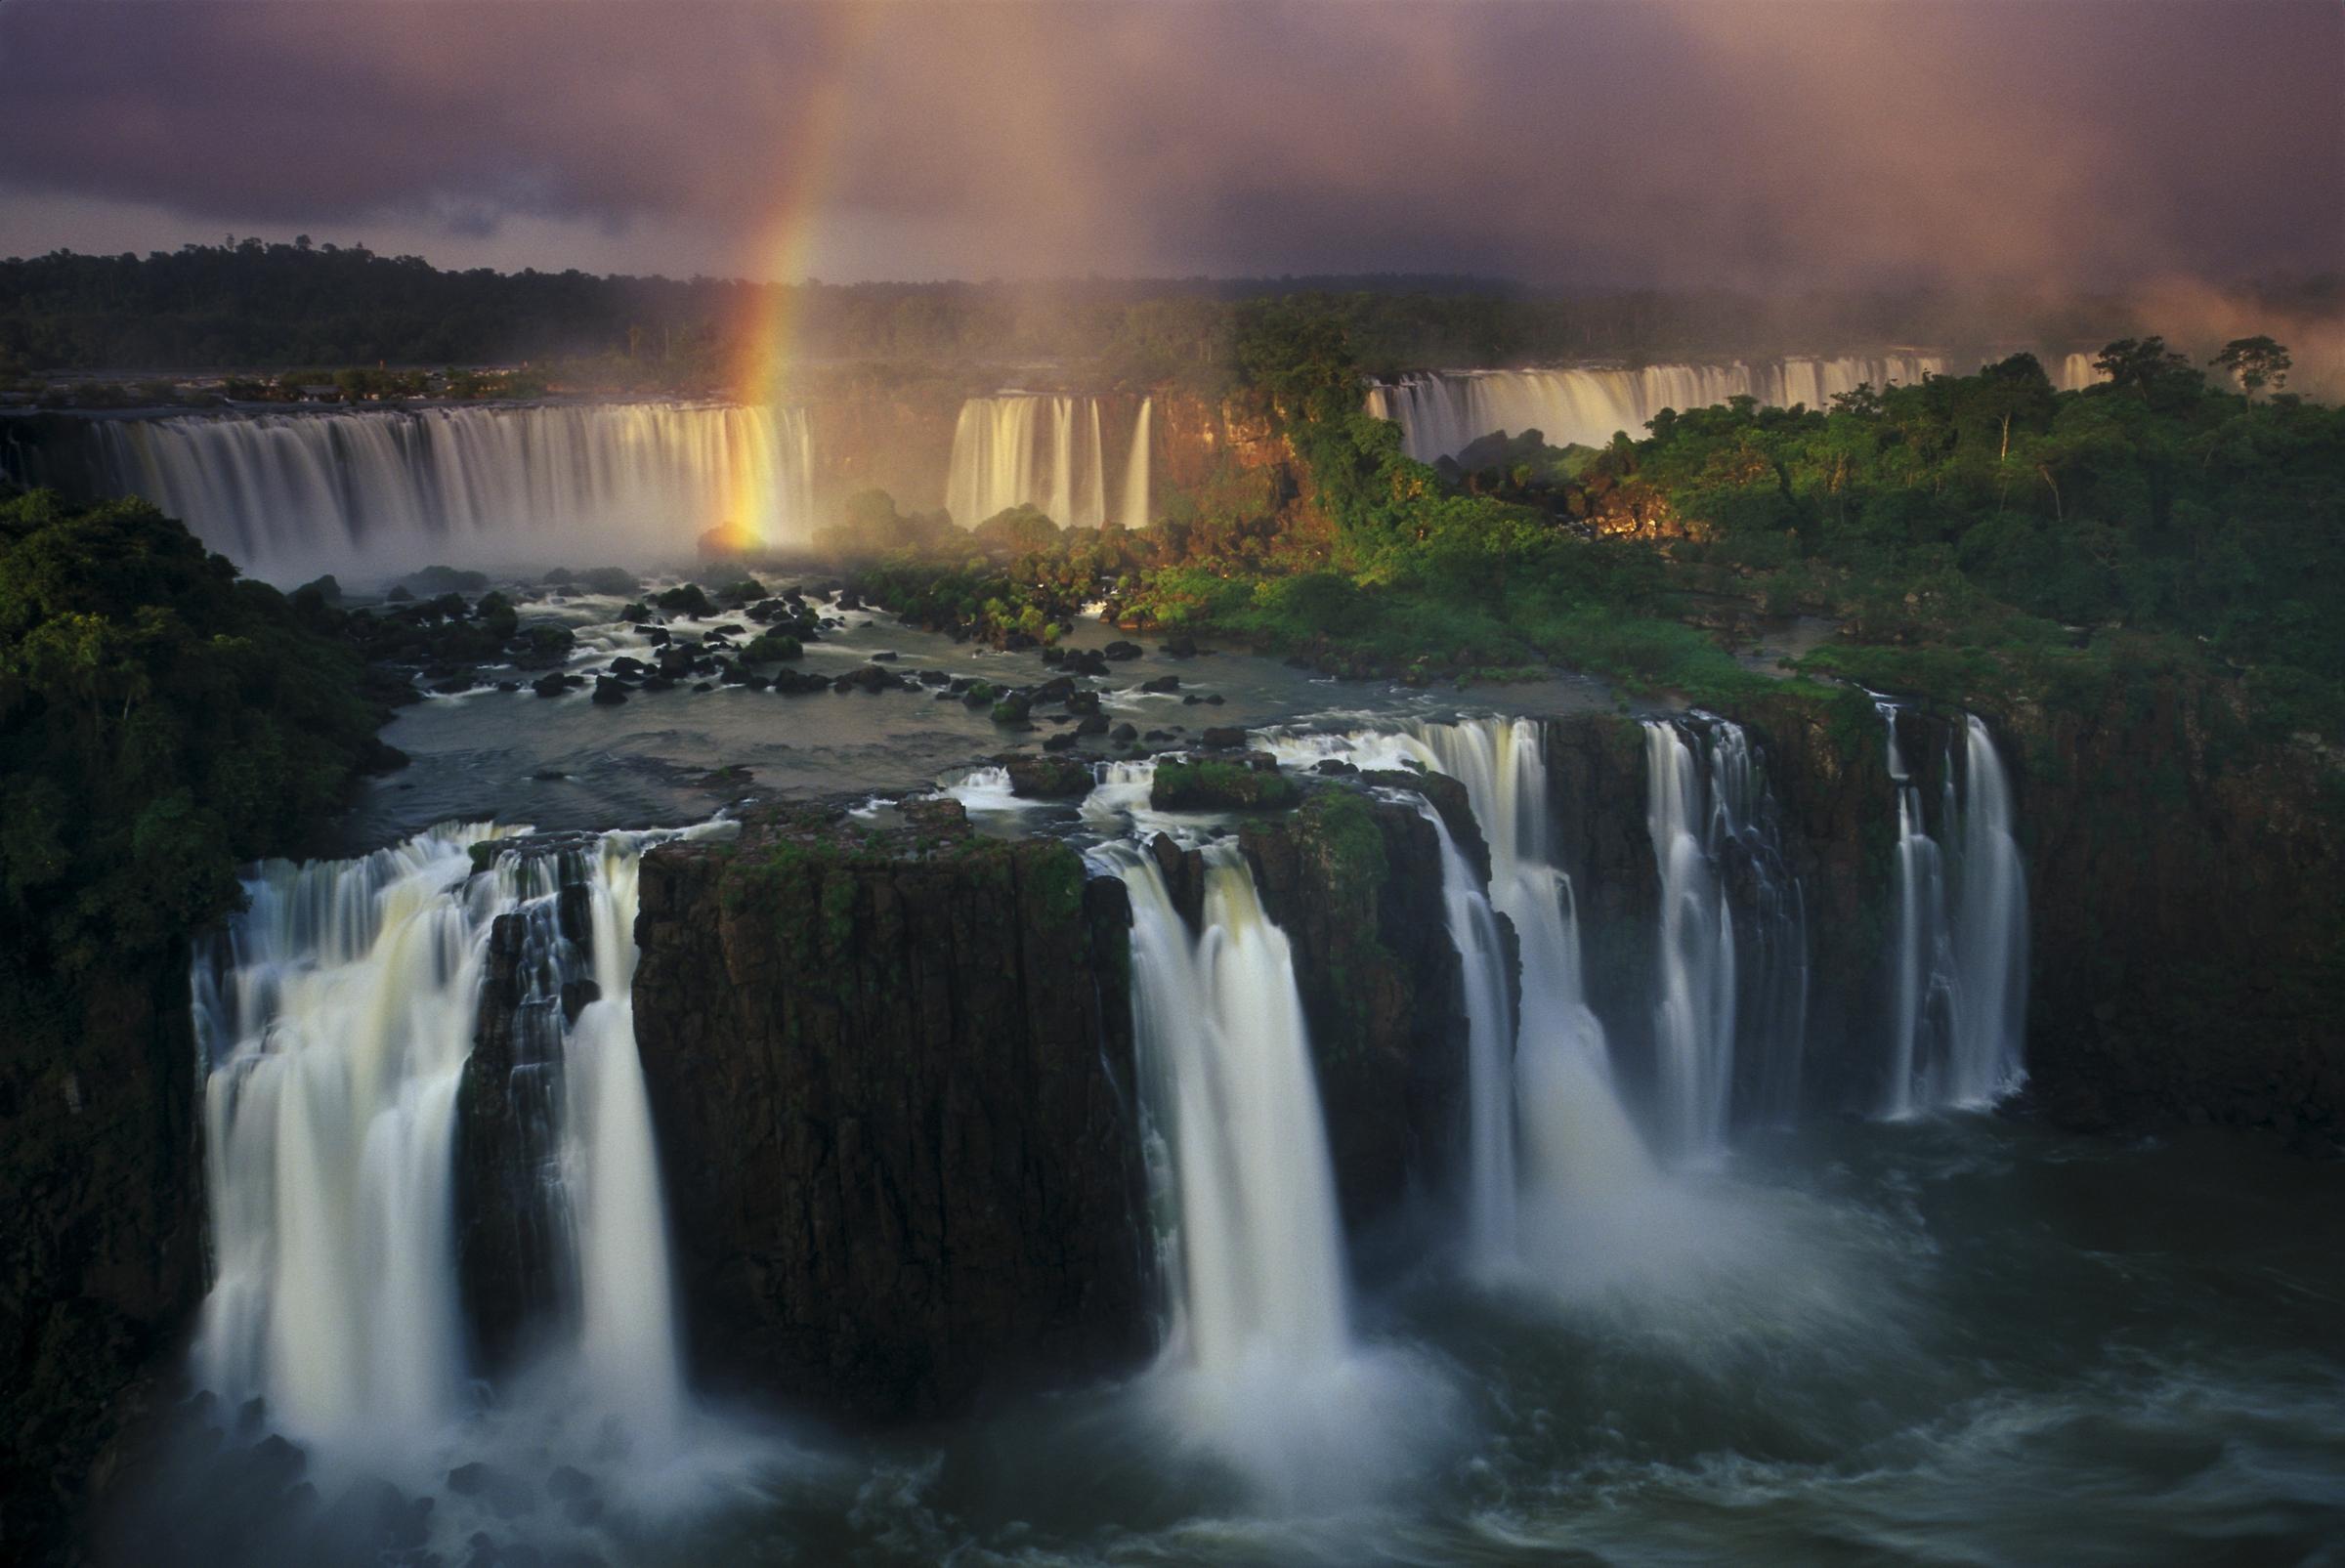 Iguazul Falls Wallpaper Iguaz 250 Falls Iguaz 250 National Park Argentina Art Wolfe